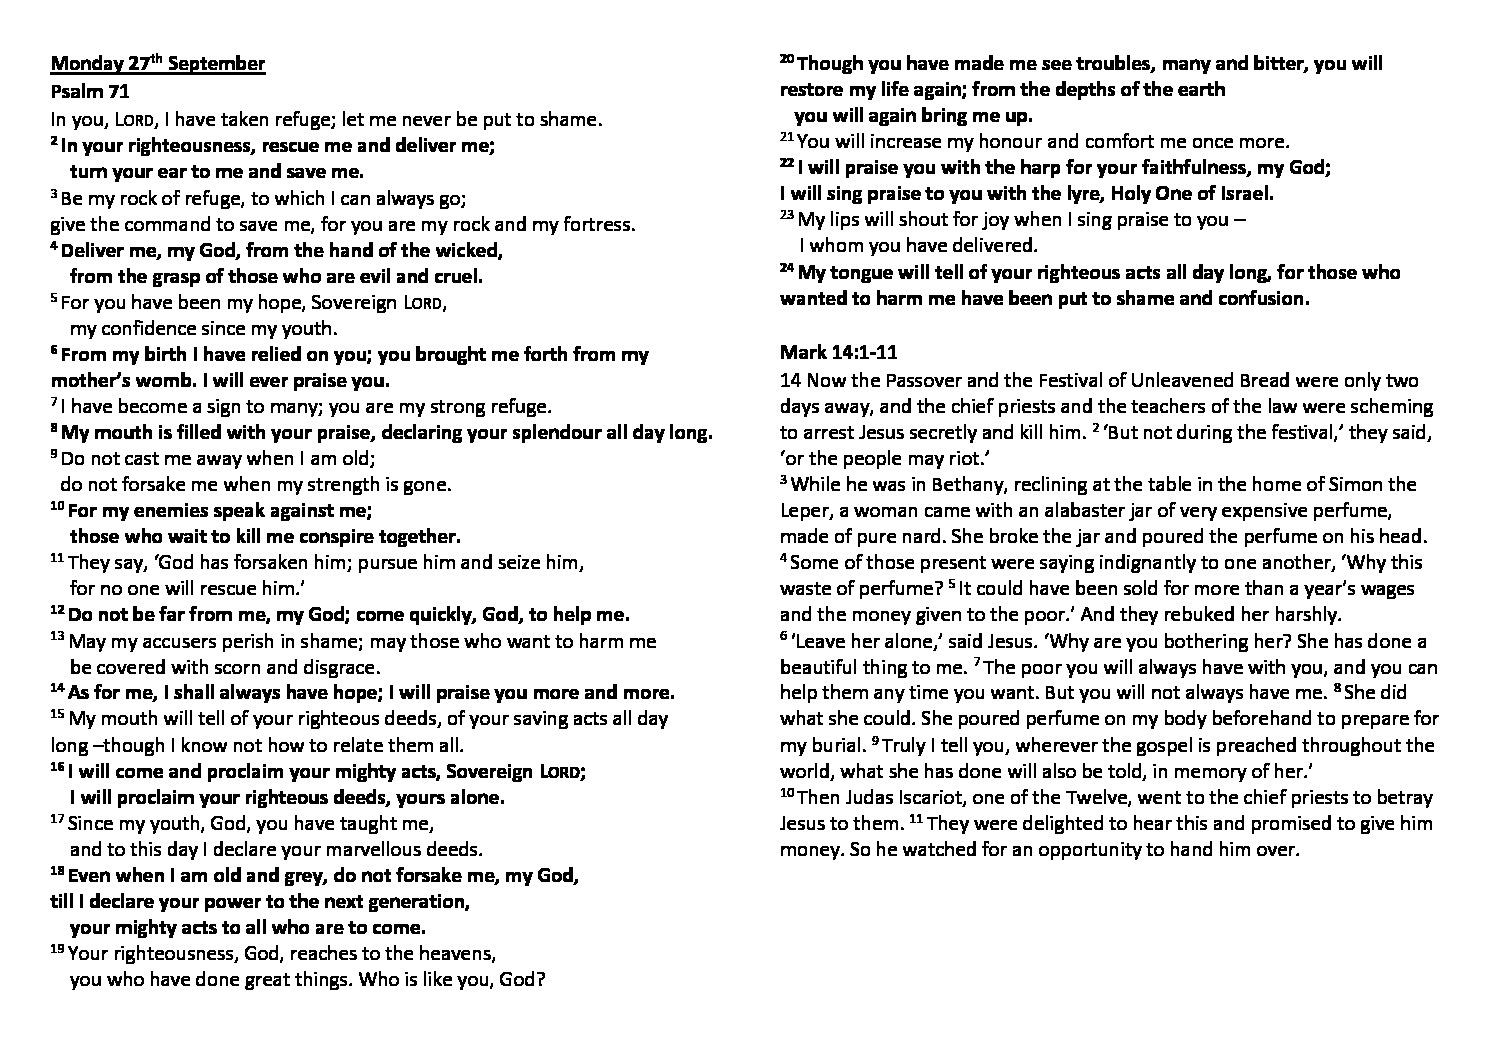 thumbnail of Morning Prayer and Psalms Monday27th September – Saturday 2nd October